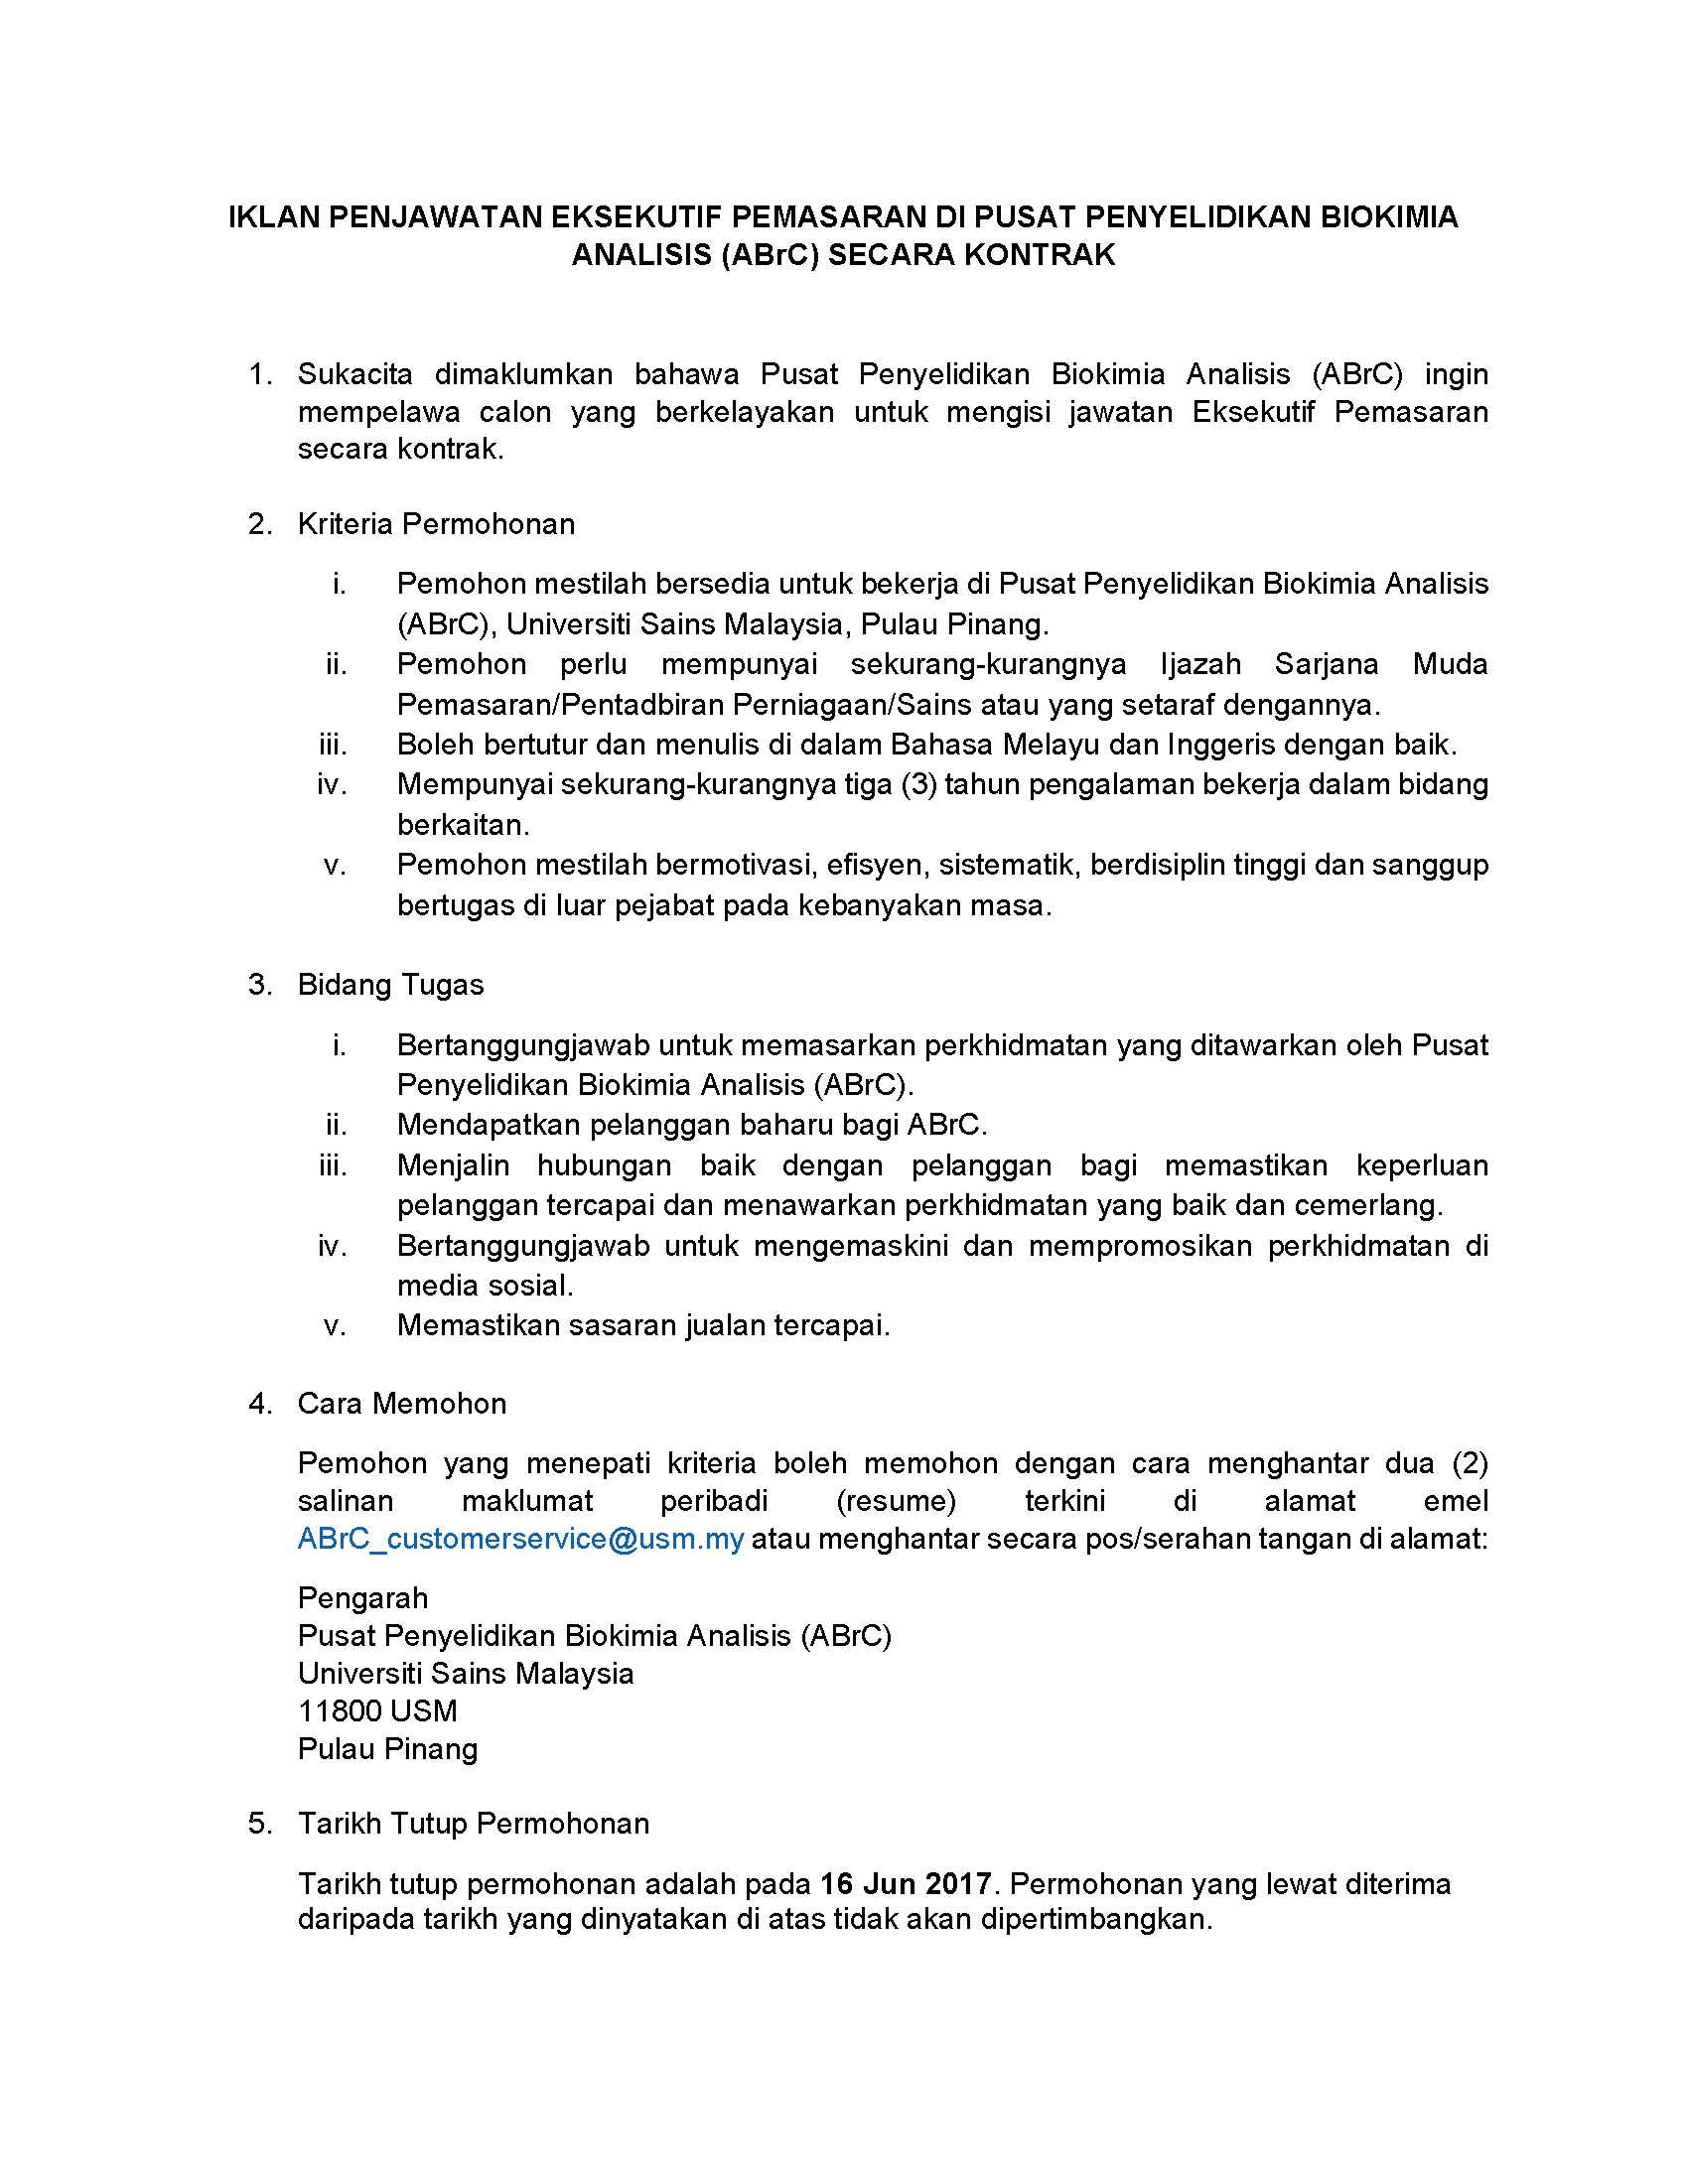 Excellent Resume Bahasa Melayu Images - Entry Level Resume ...